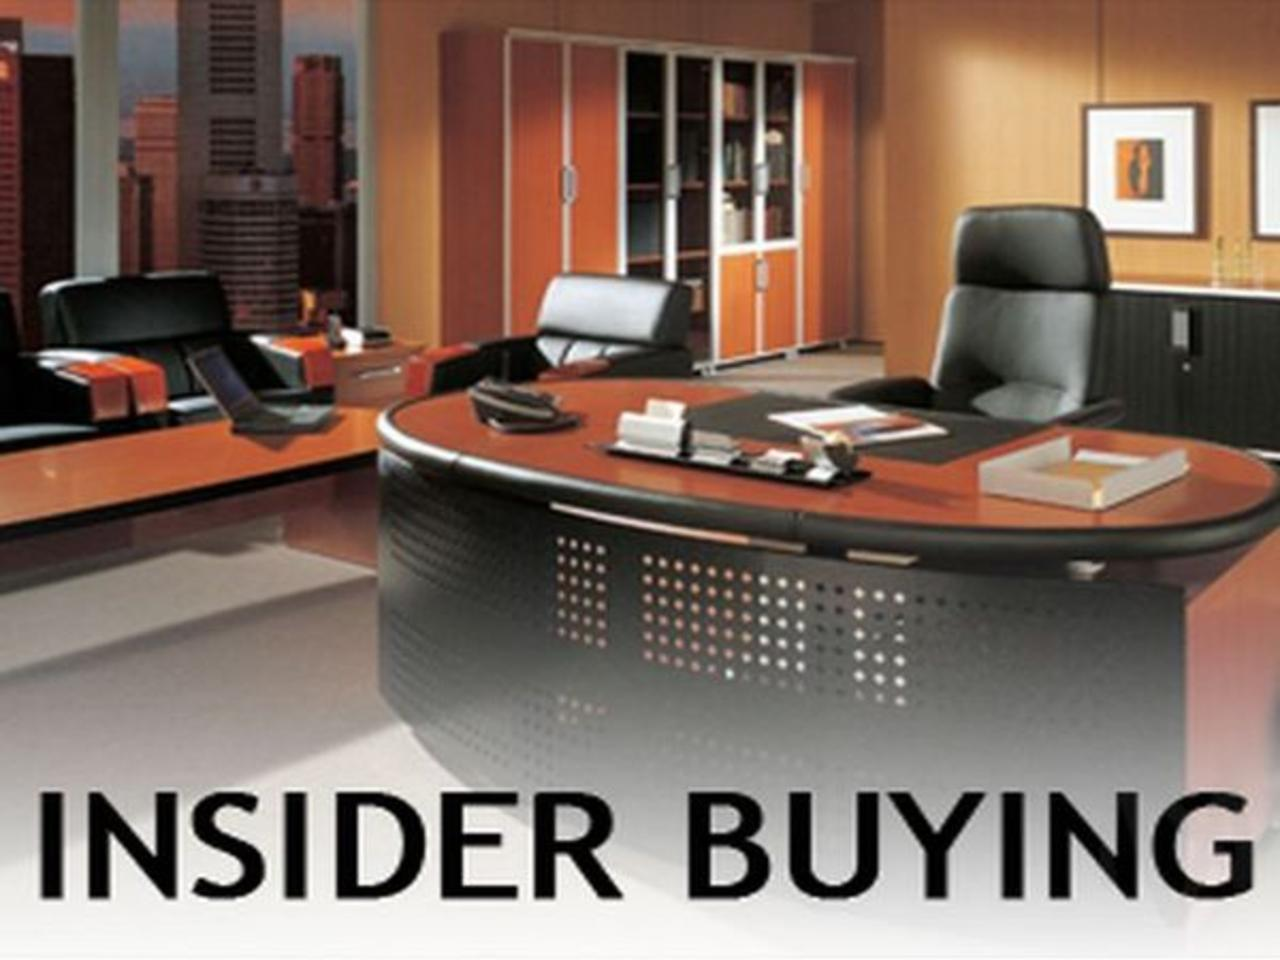 Tuesday 9/14 Insider Buying Report: BANF, SUNL